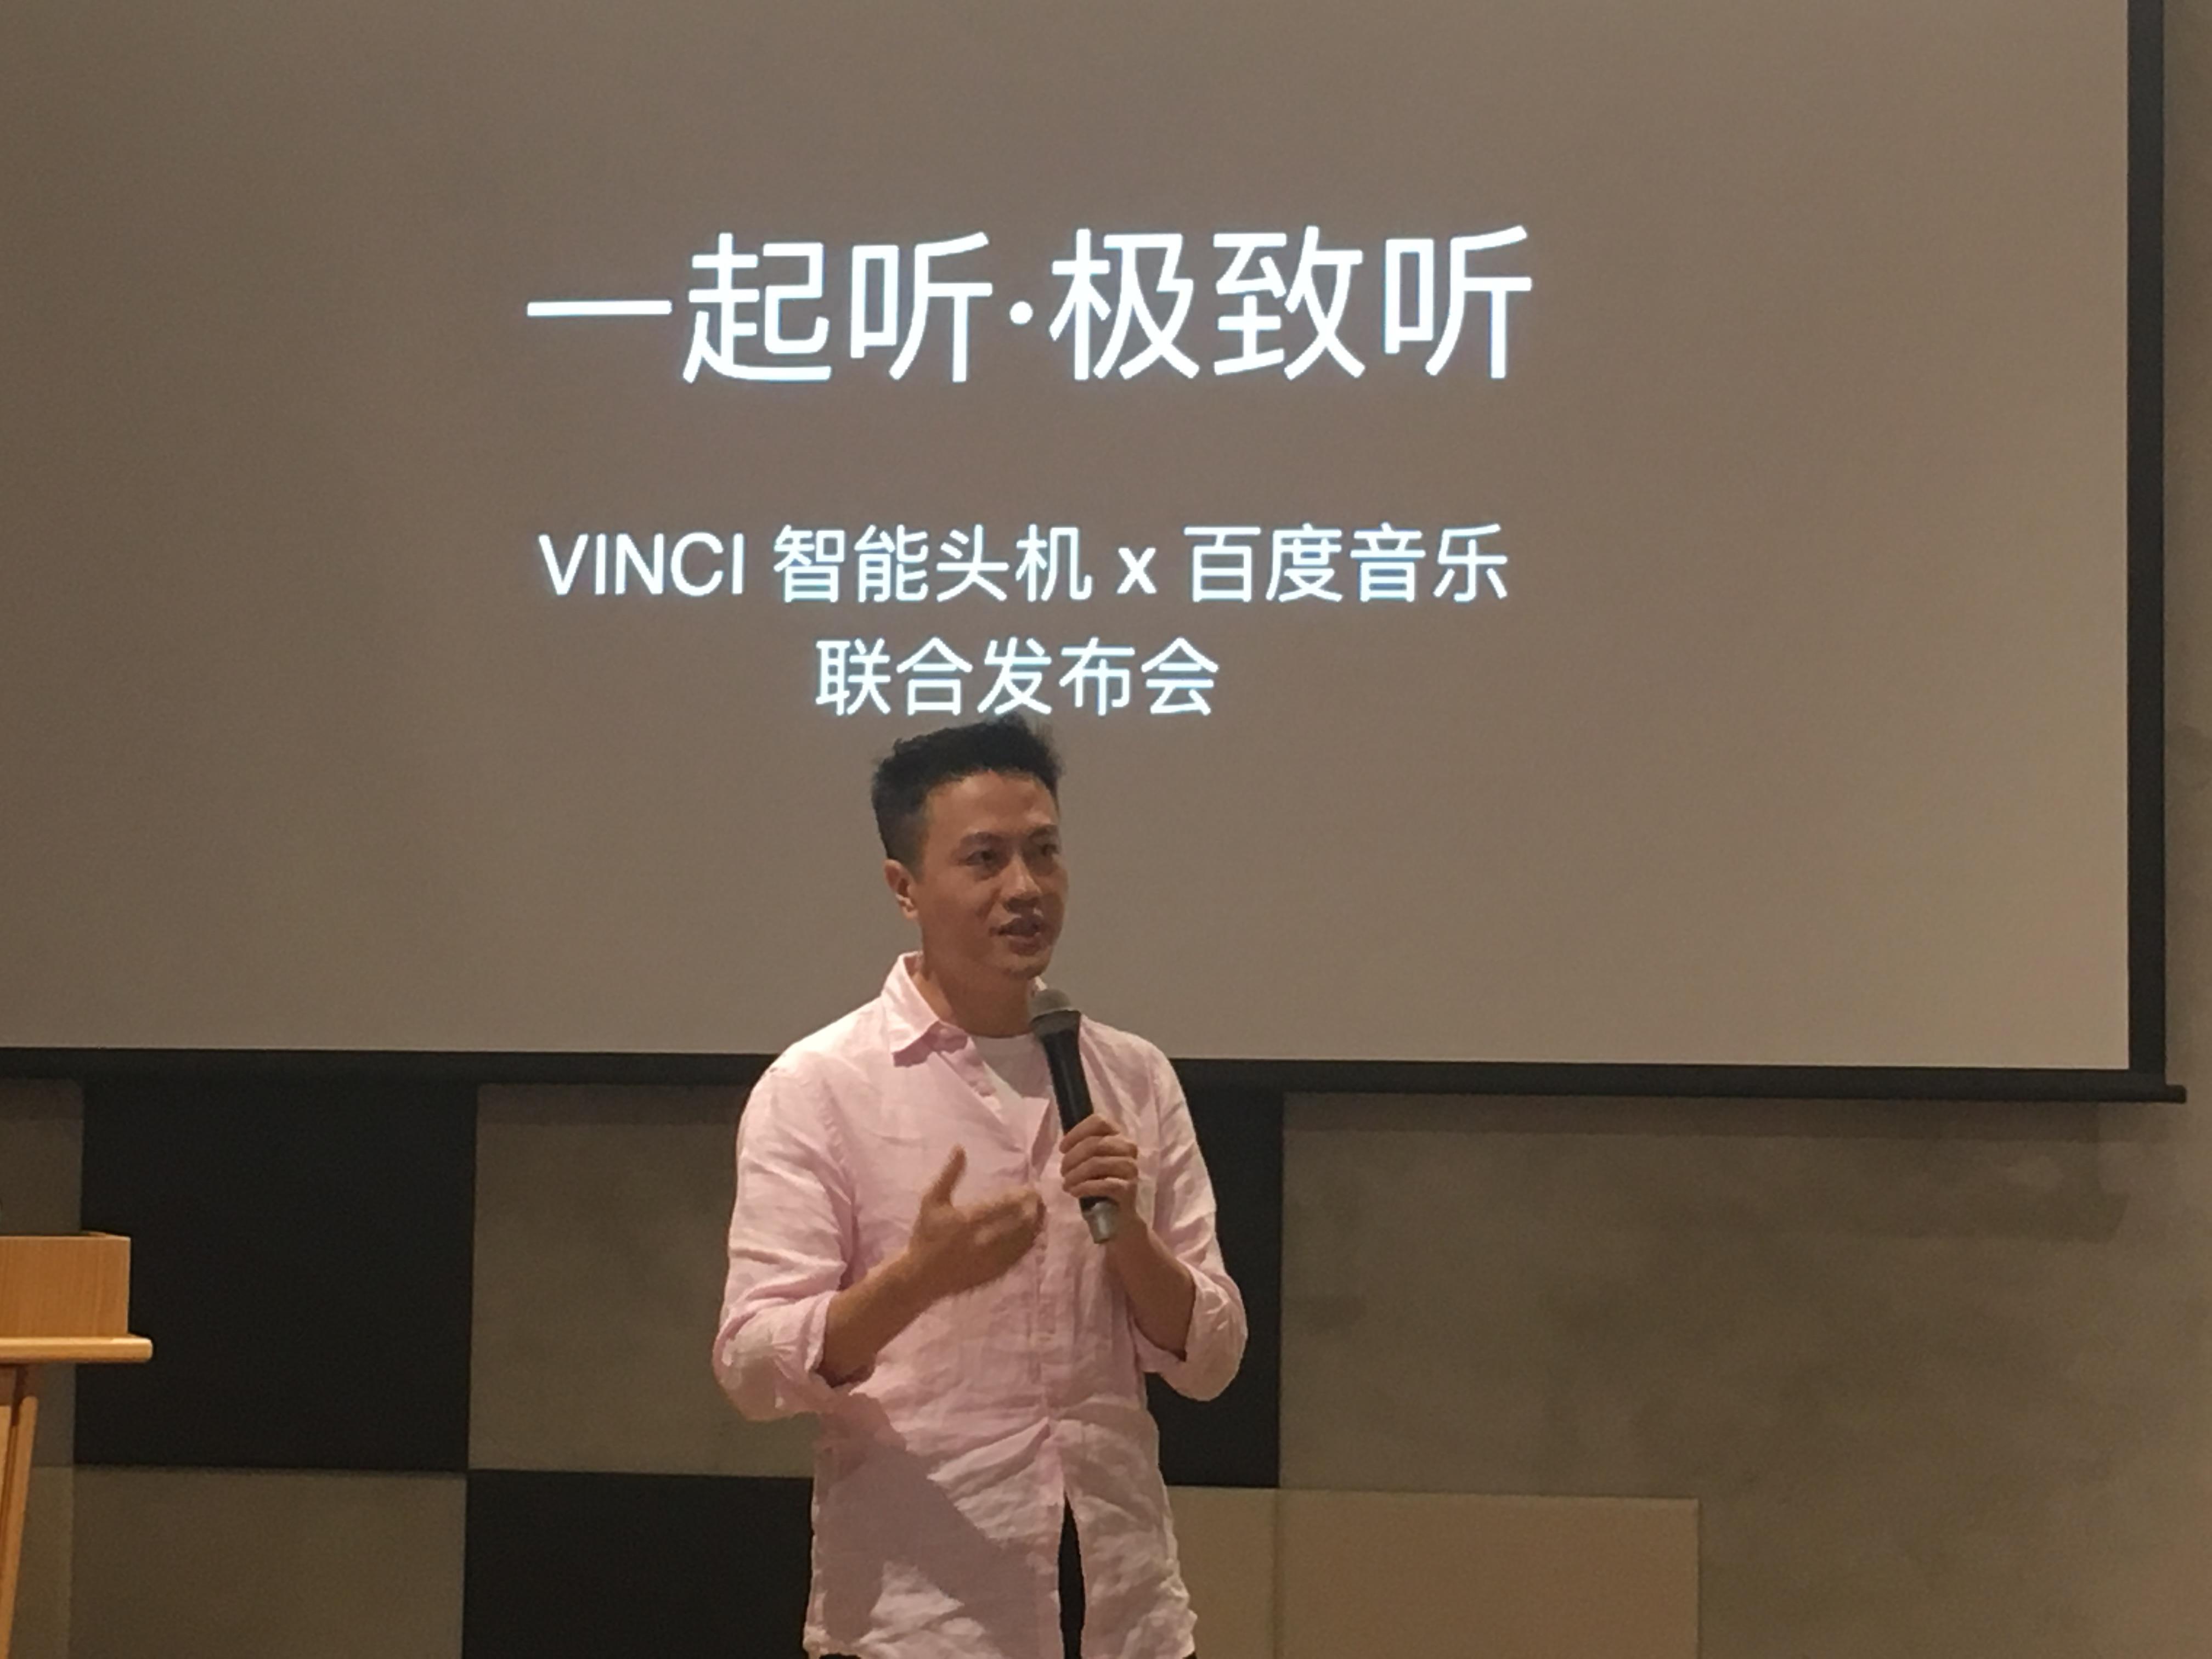 Vinci Lite百度音乐定制款正式发布 售价为1299元